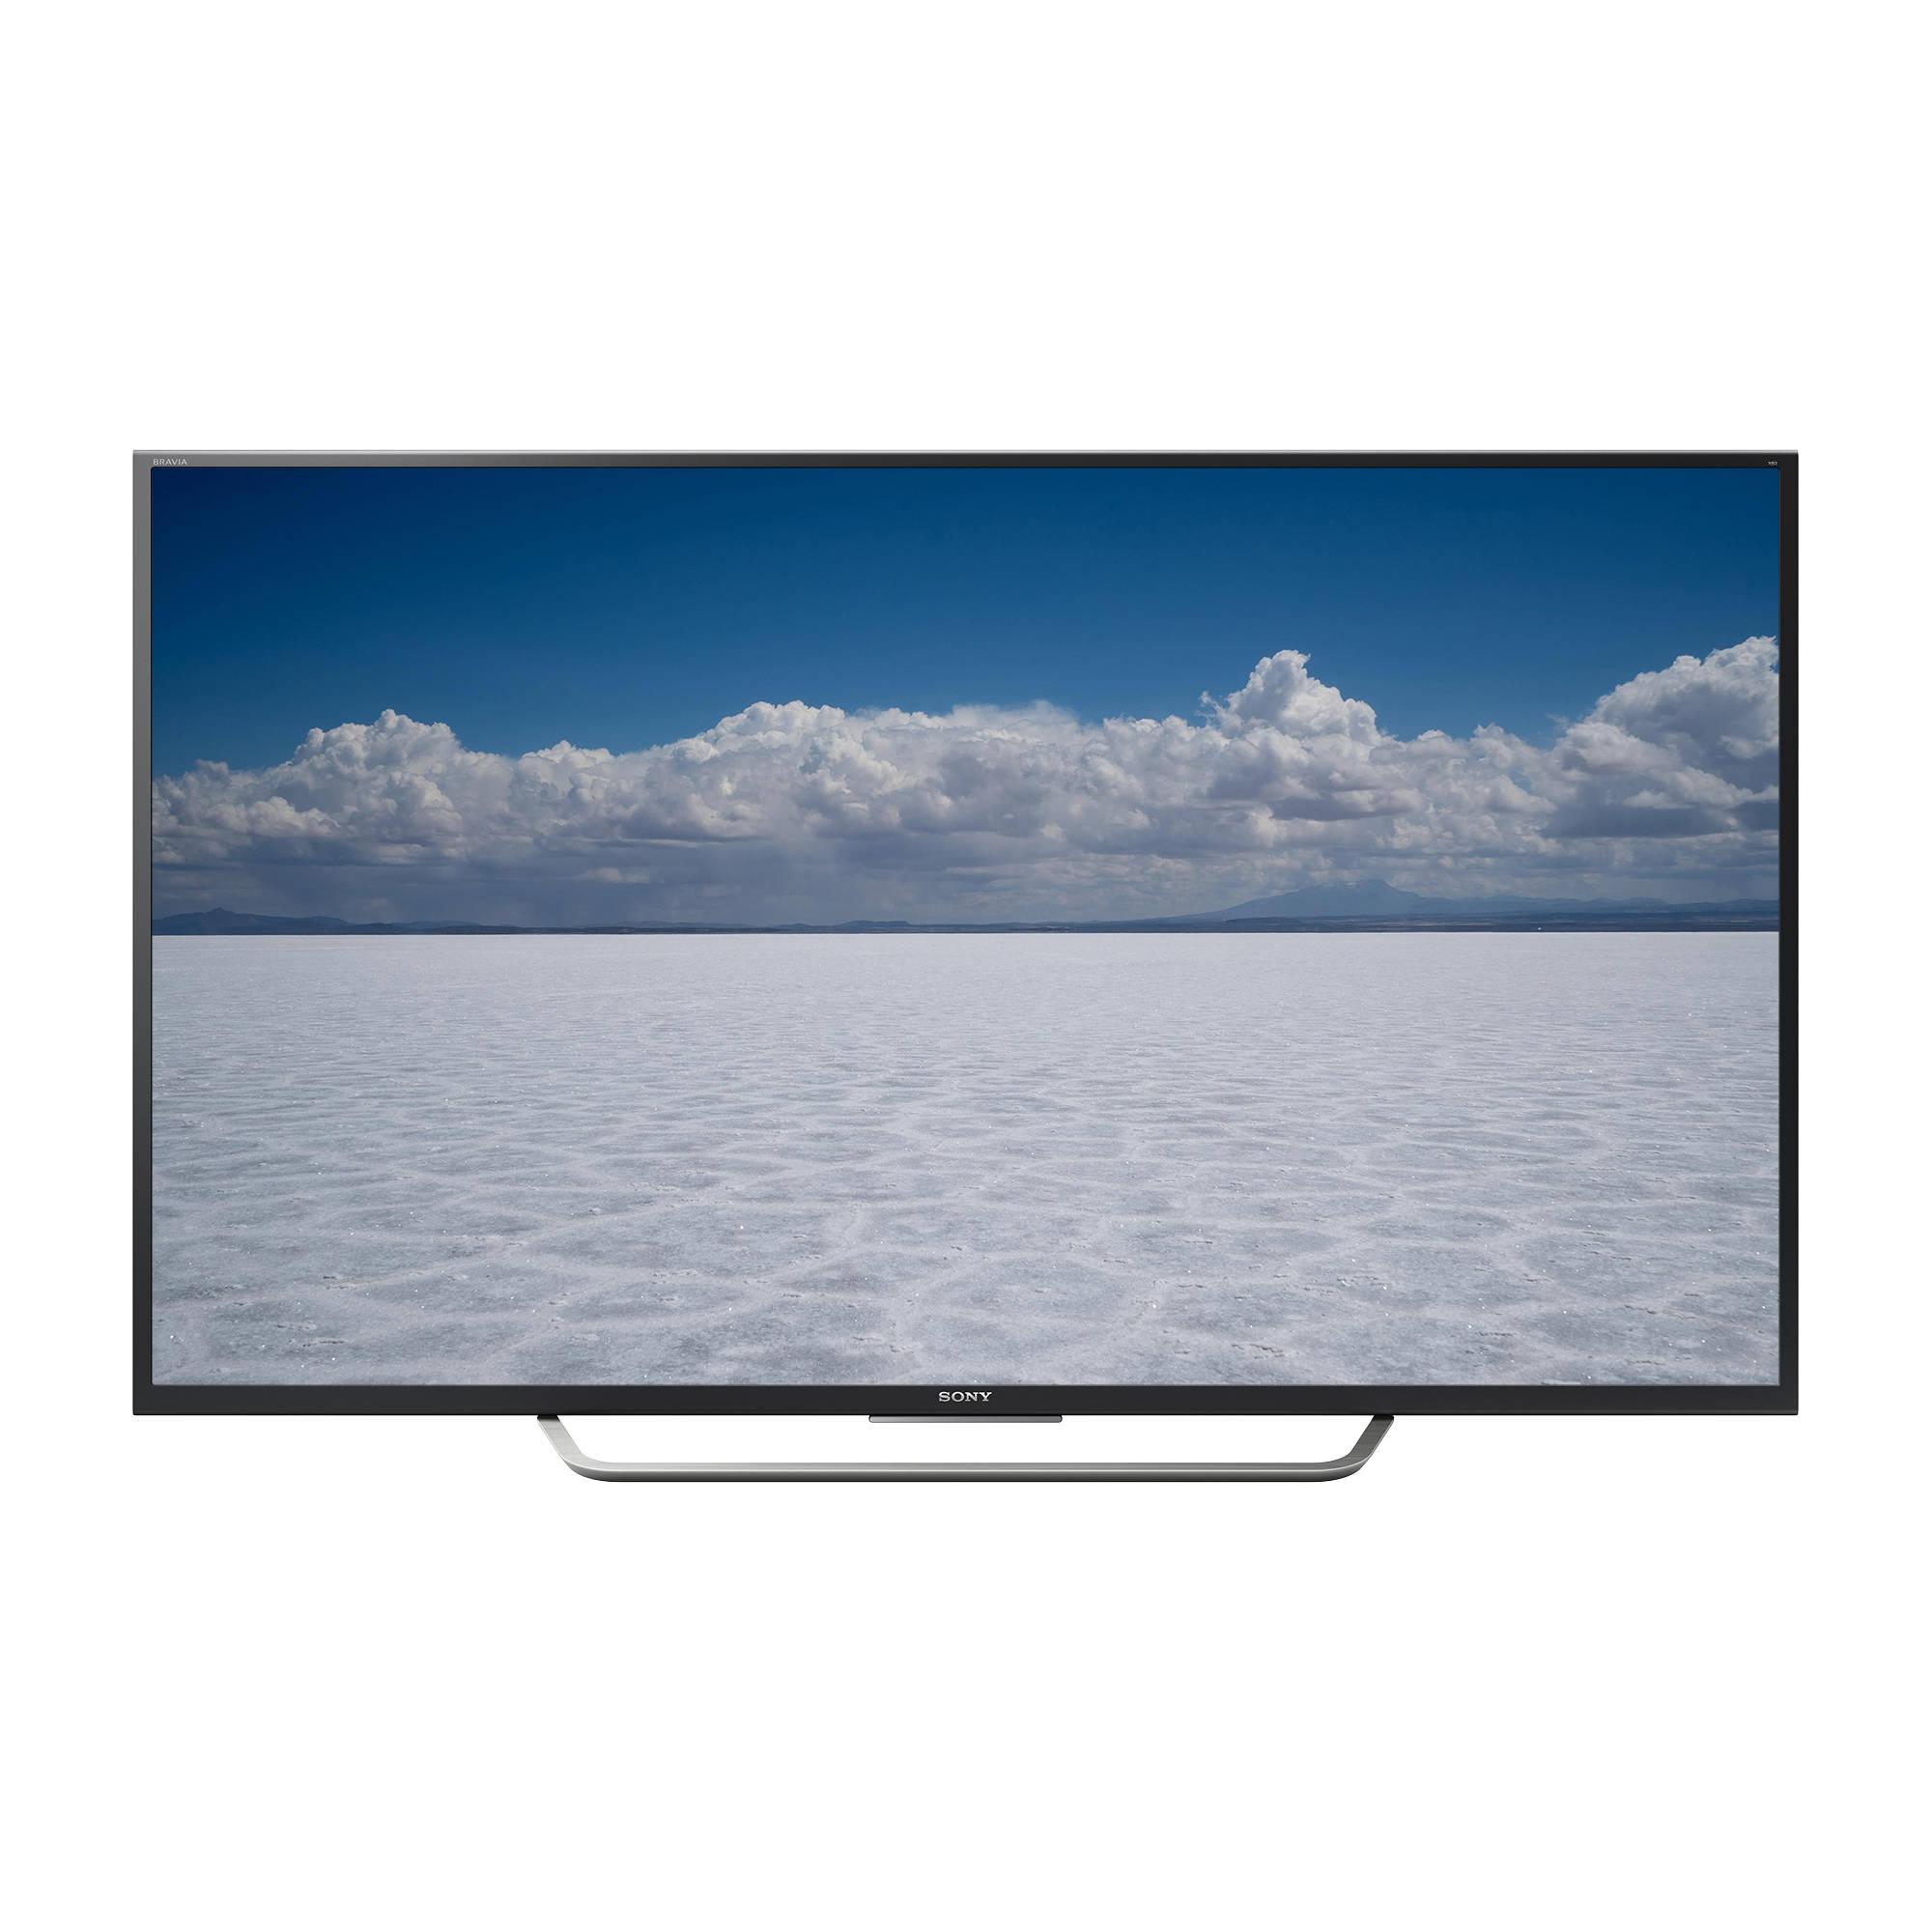 sony xbr x750d series 65 class 4k smart led tv xbr 65x750d. Black Bedroom Furniture Sets. Home Design Ideas